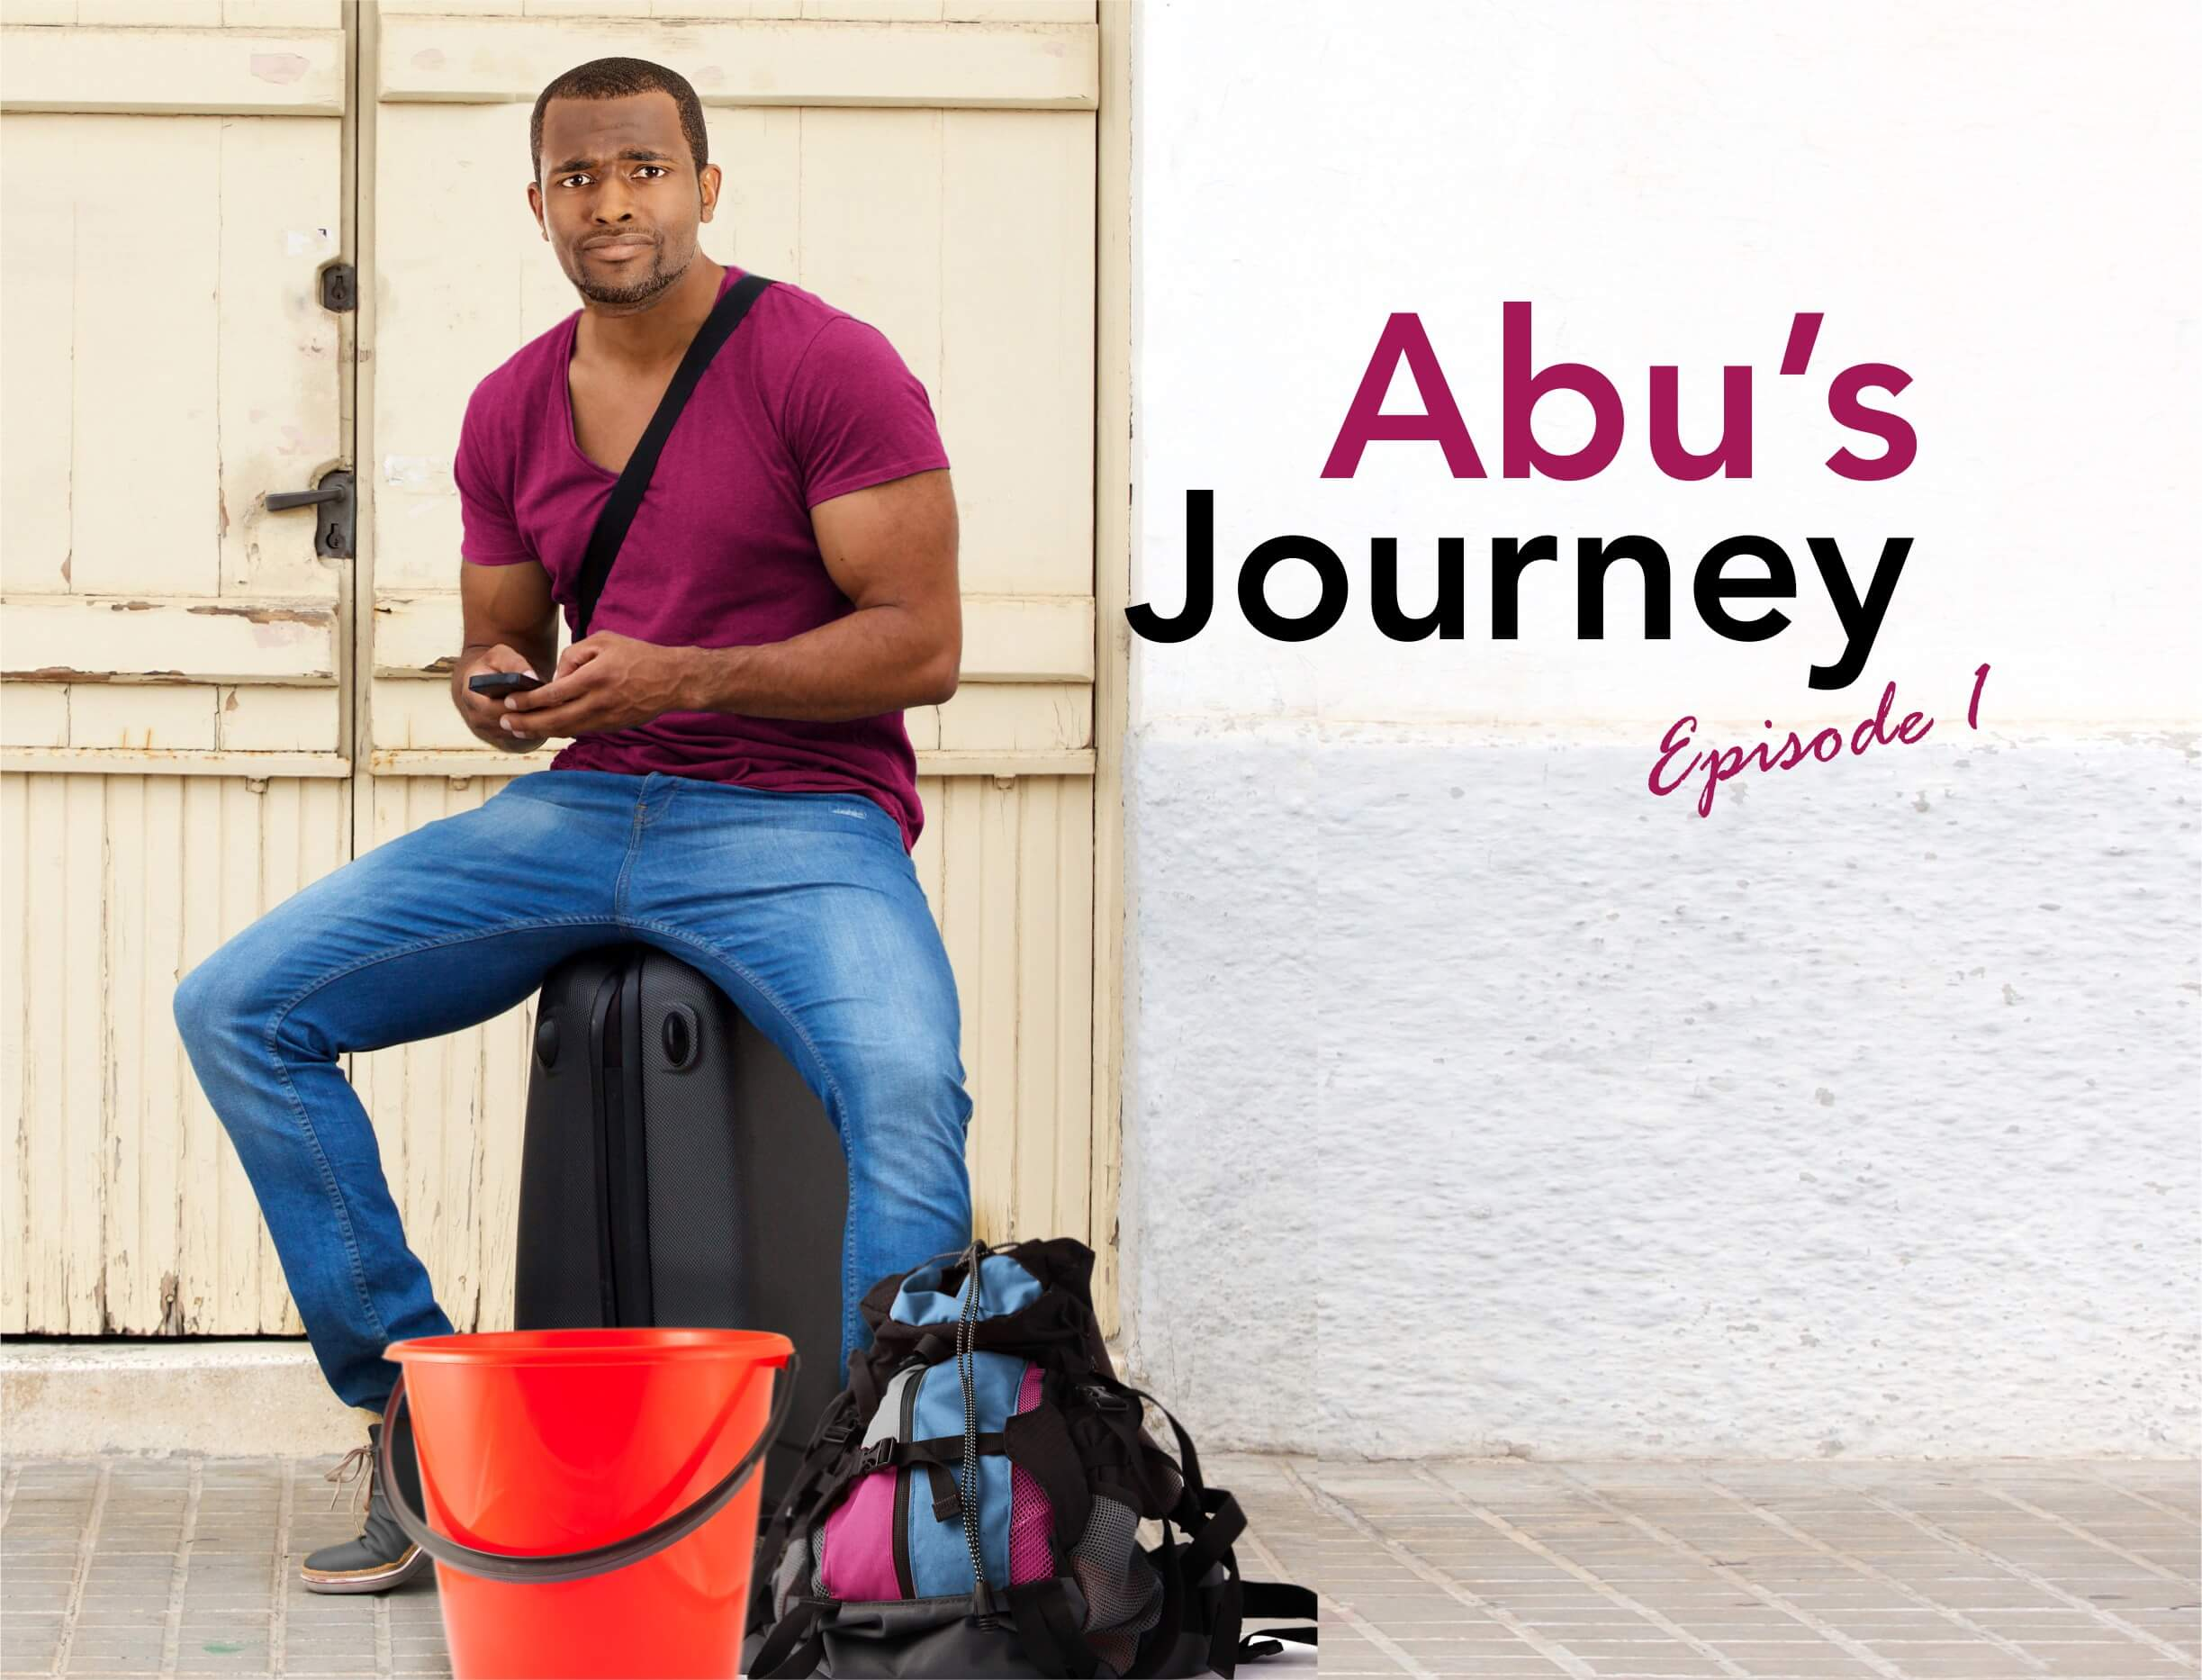 Abu's NYSC journey